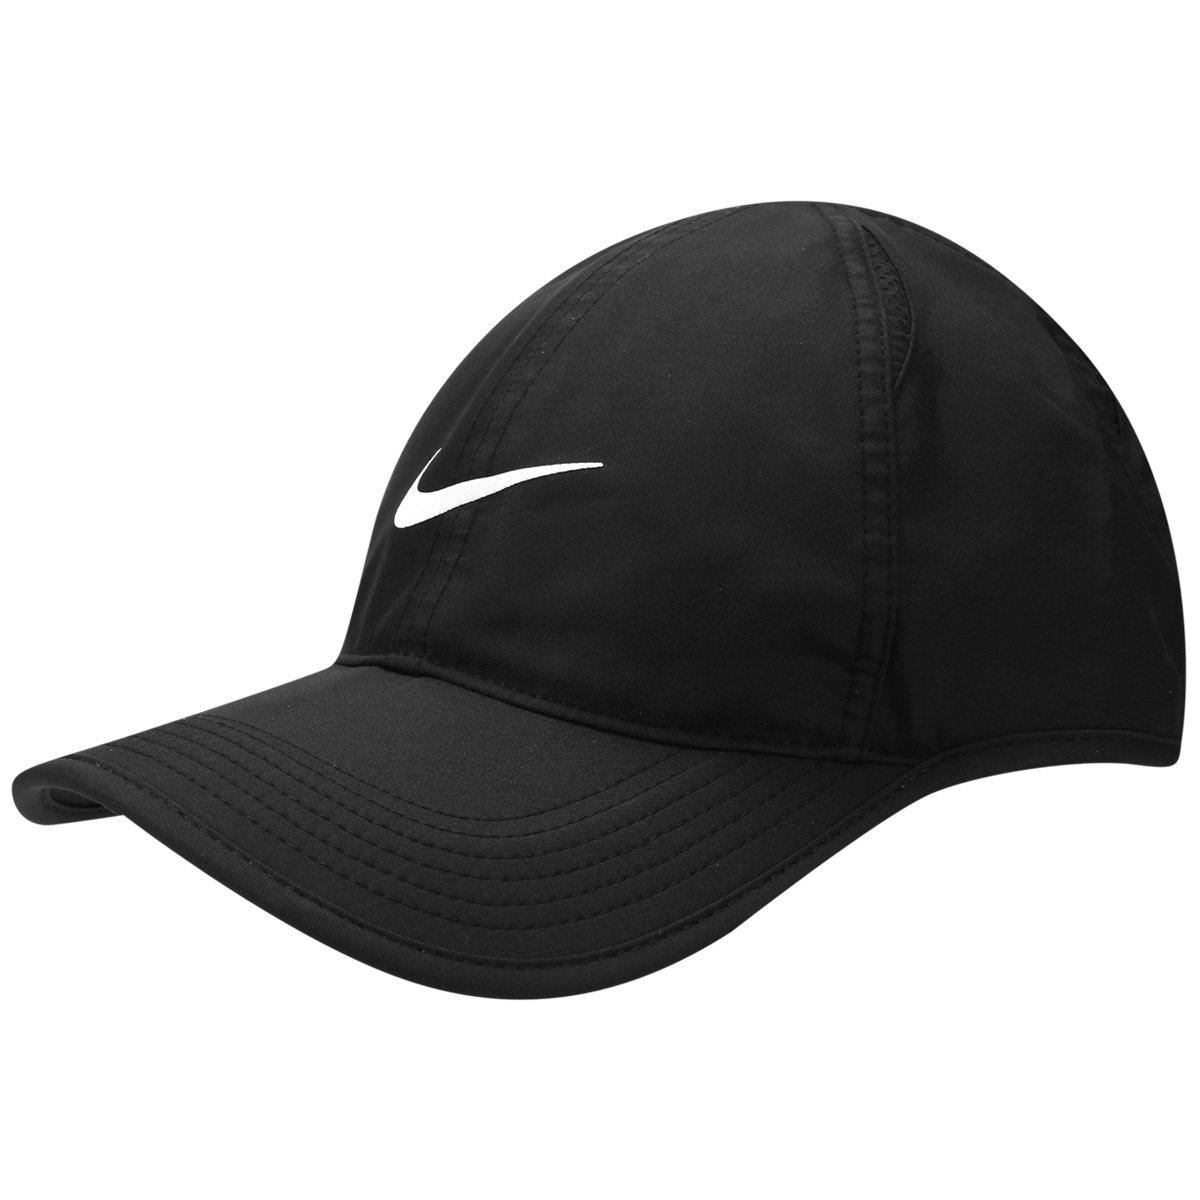 Boné Nike Aba Curva Featherlight - Compre Agora  7fc7691595b